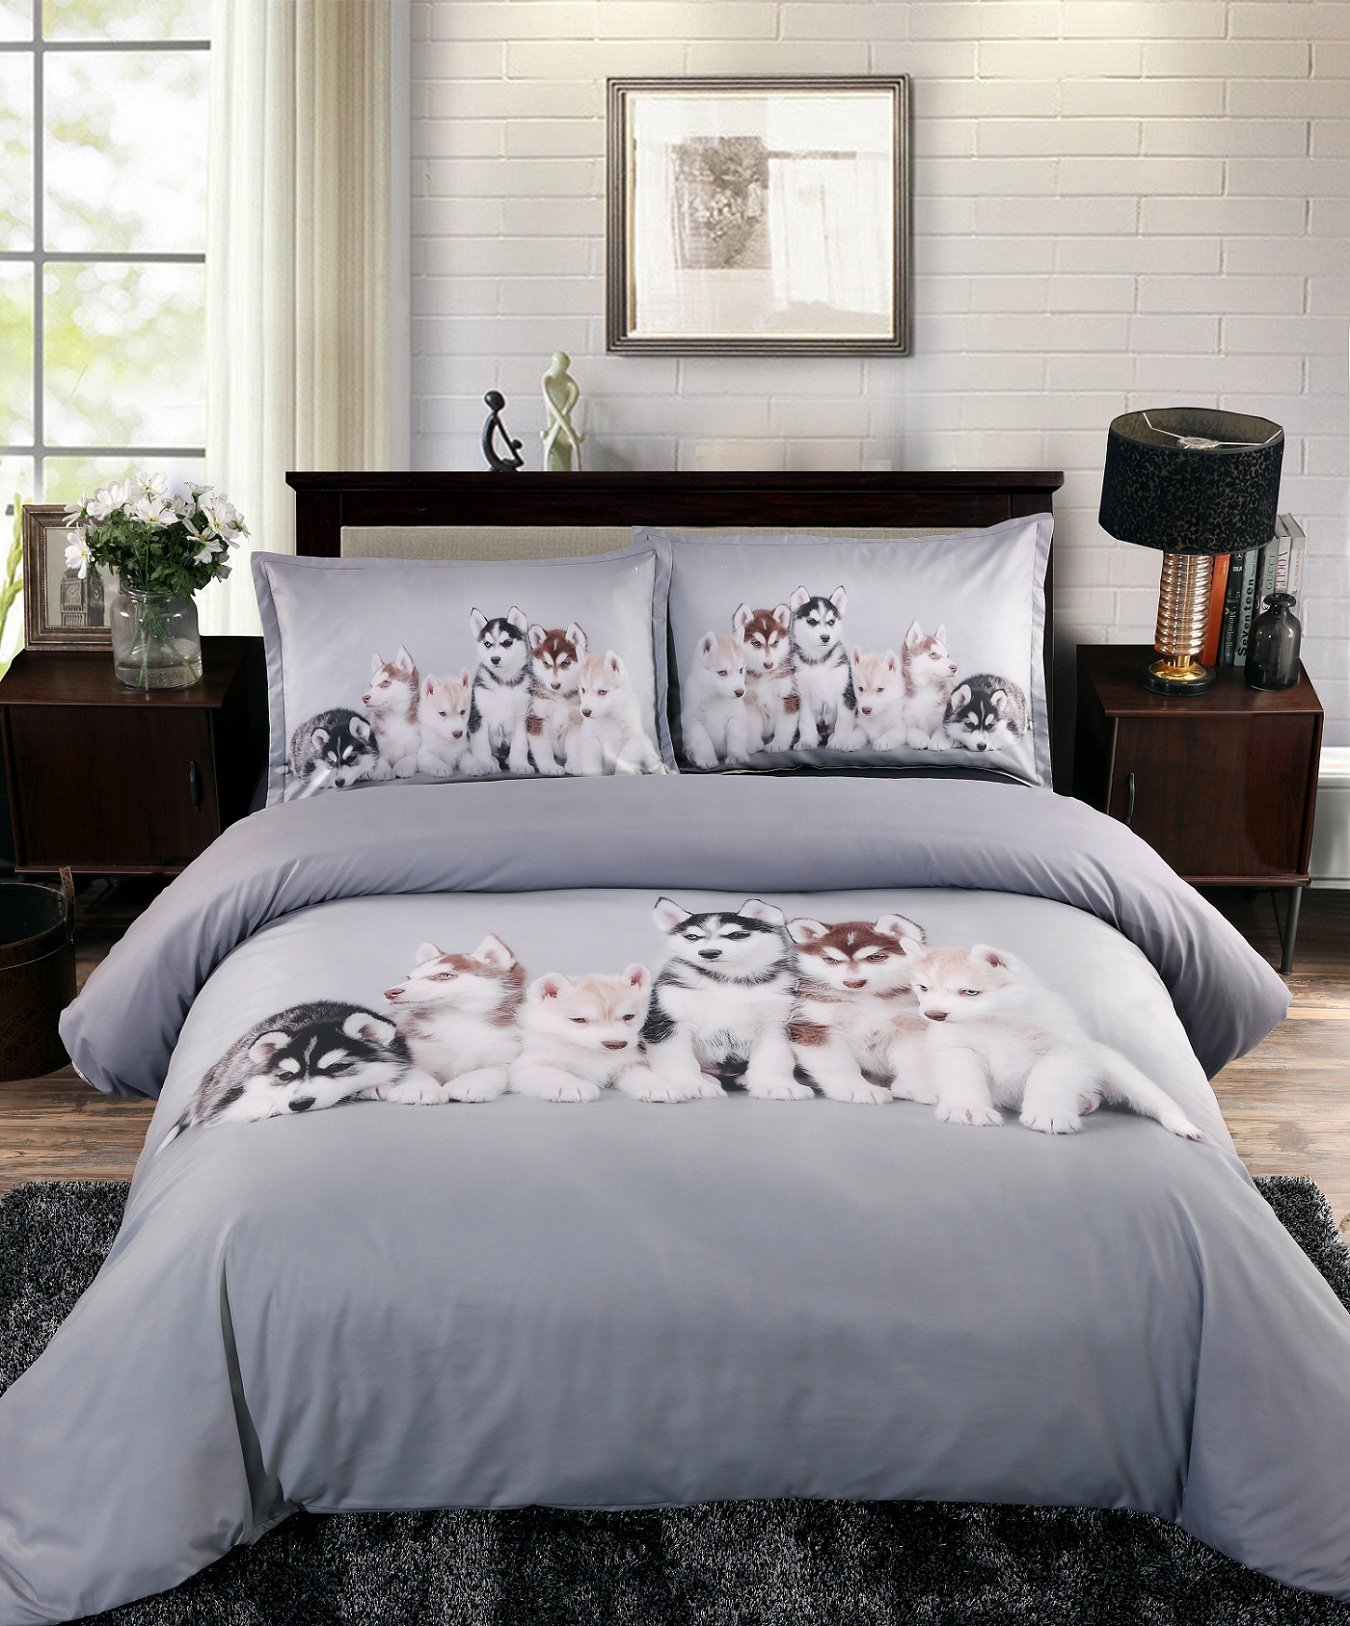 duvet floral com set ac leaves cover amazon dp microfiber printed bedding flowers navy gray grey blue pattern soft